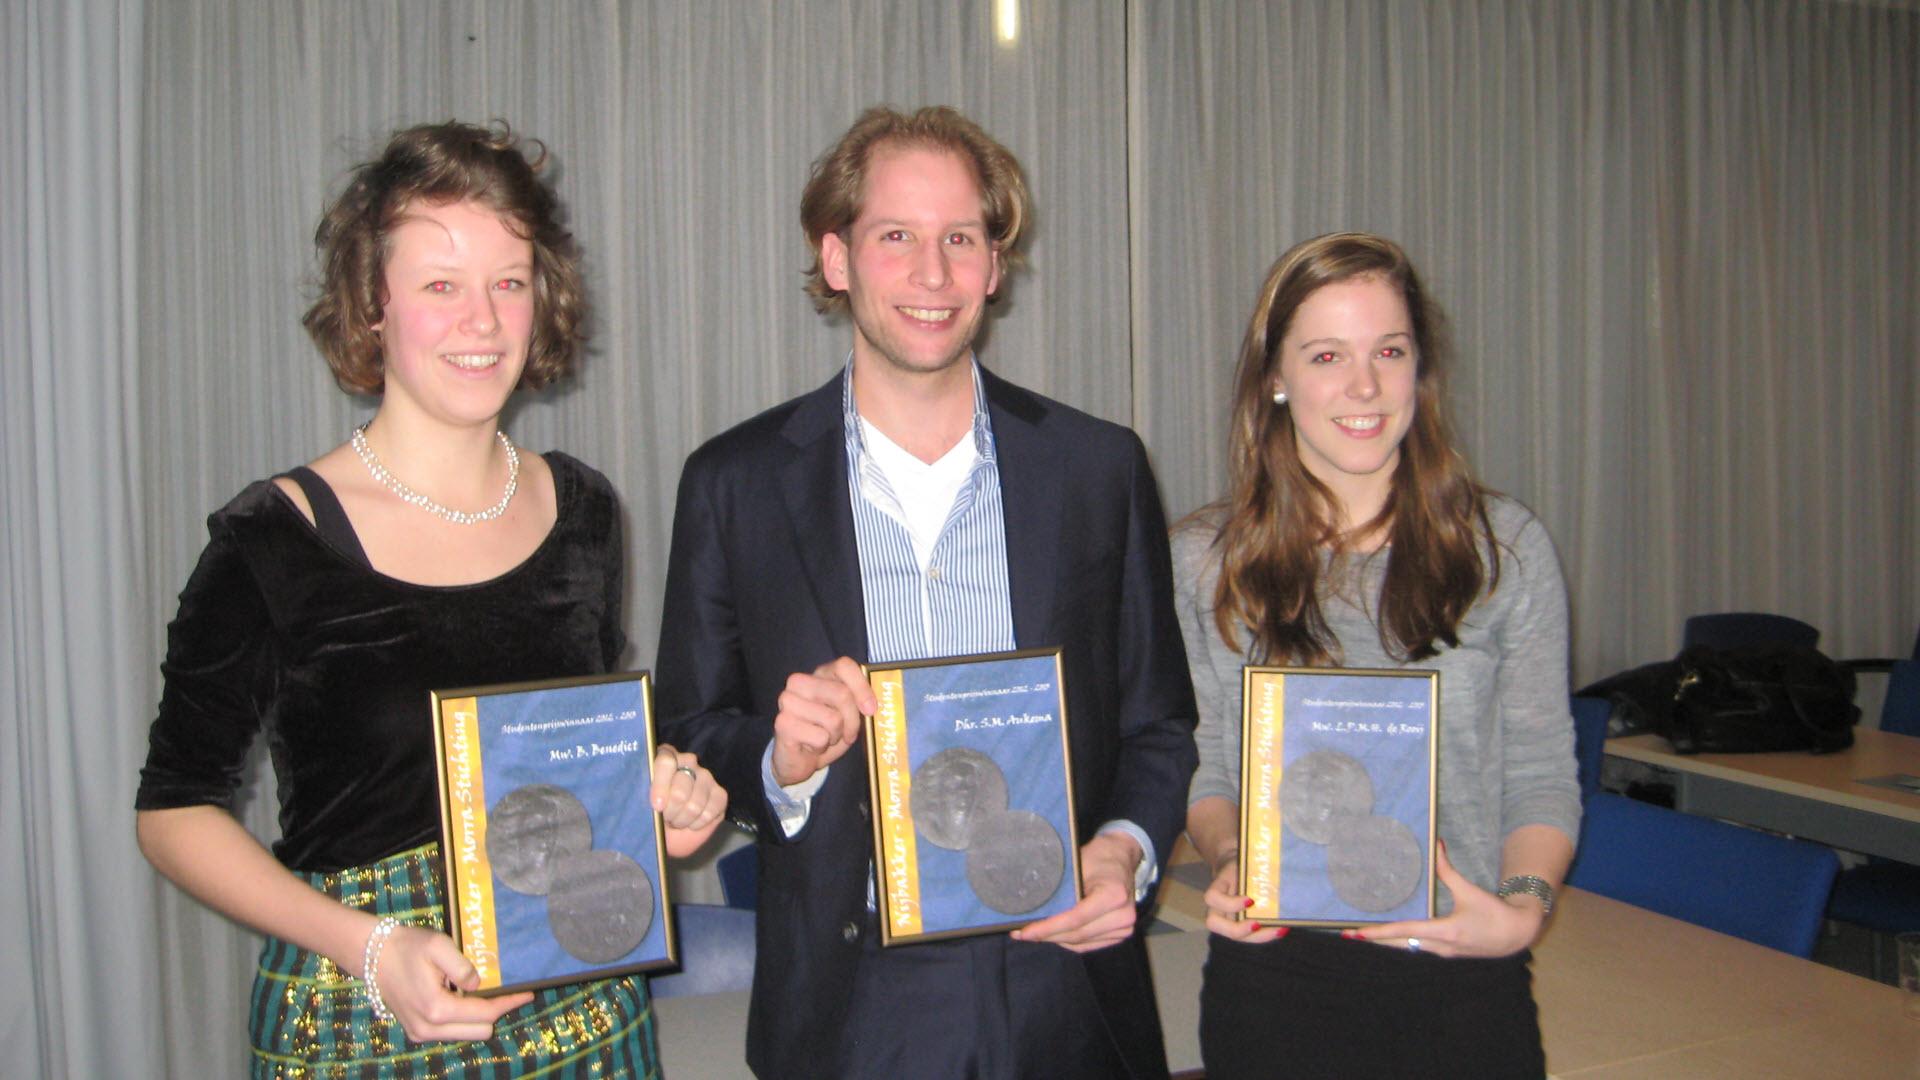 Nijbakker-Morra Stichting Prijswinnaars 2012-13